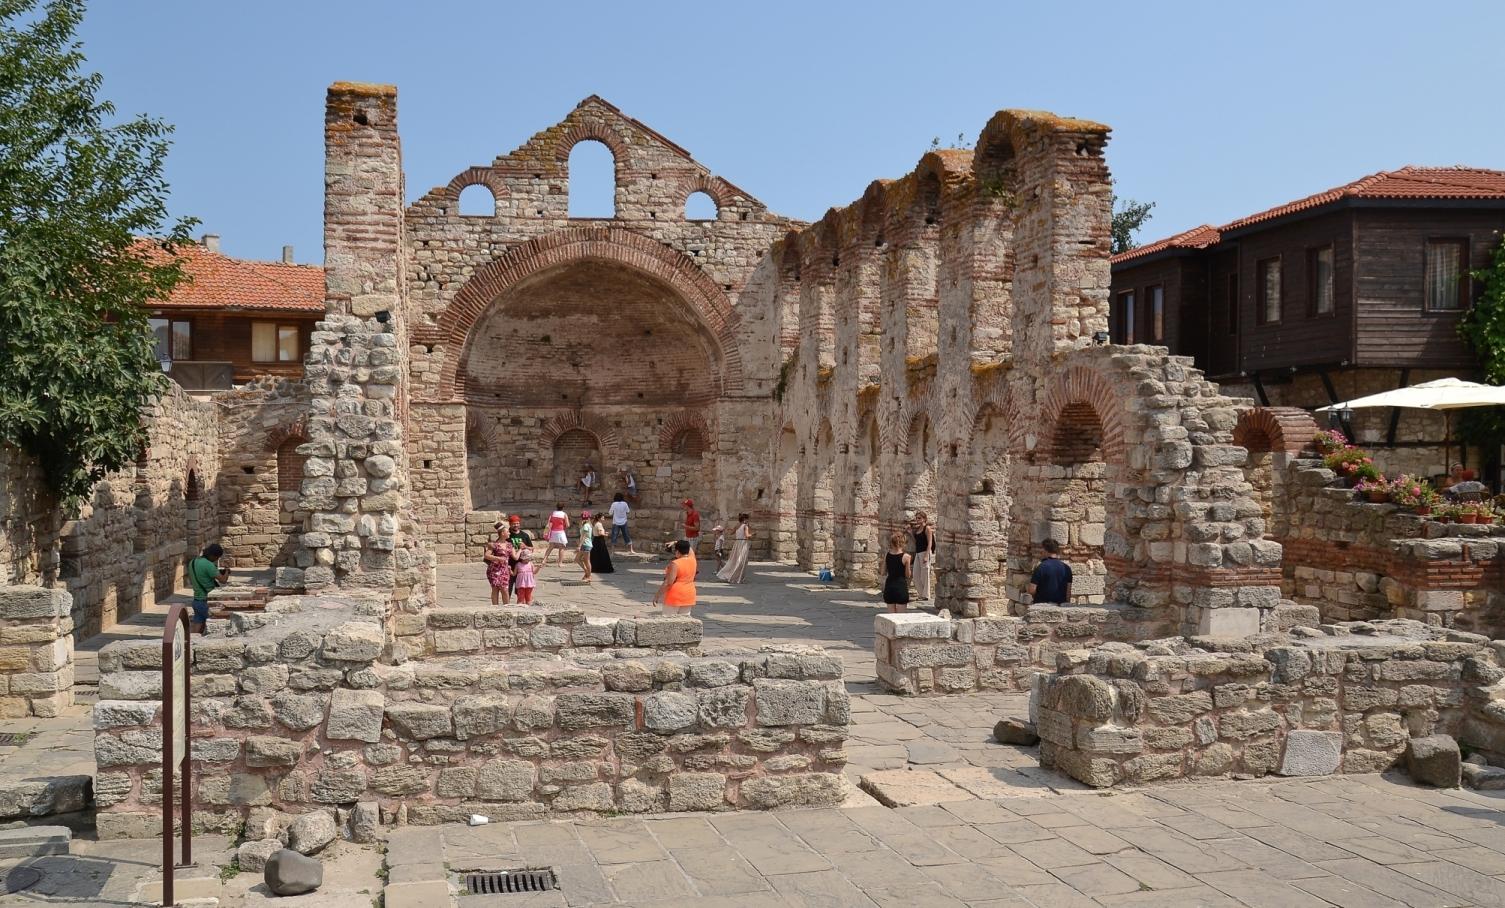 St. Sophia Basilica